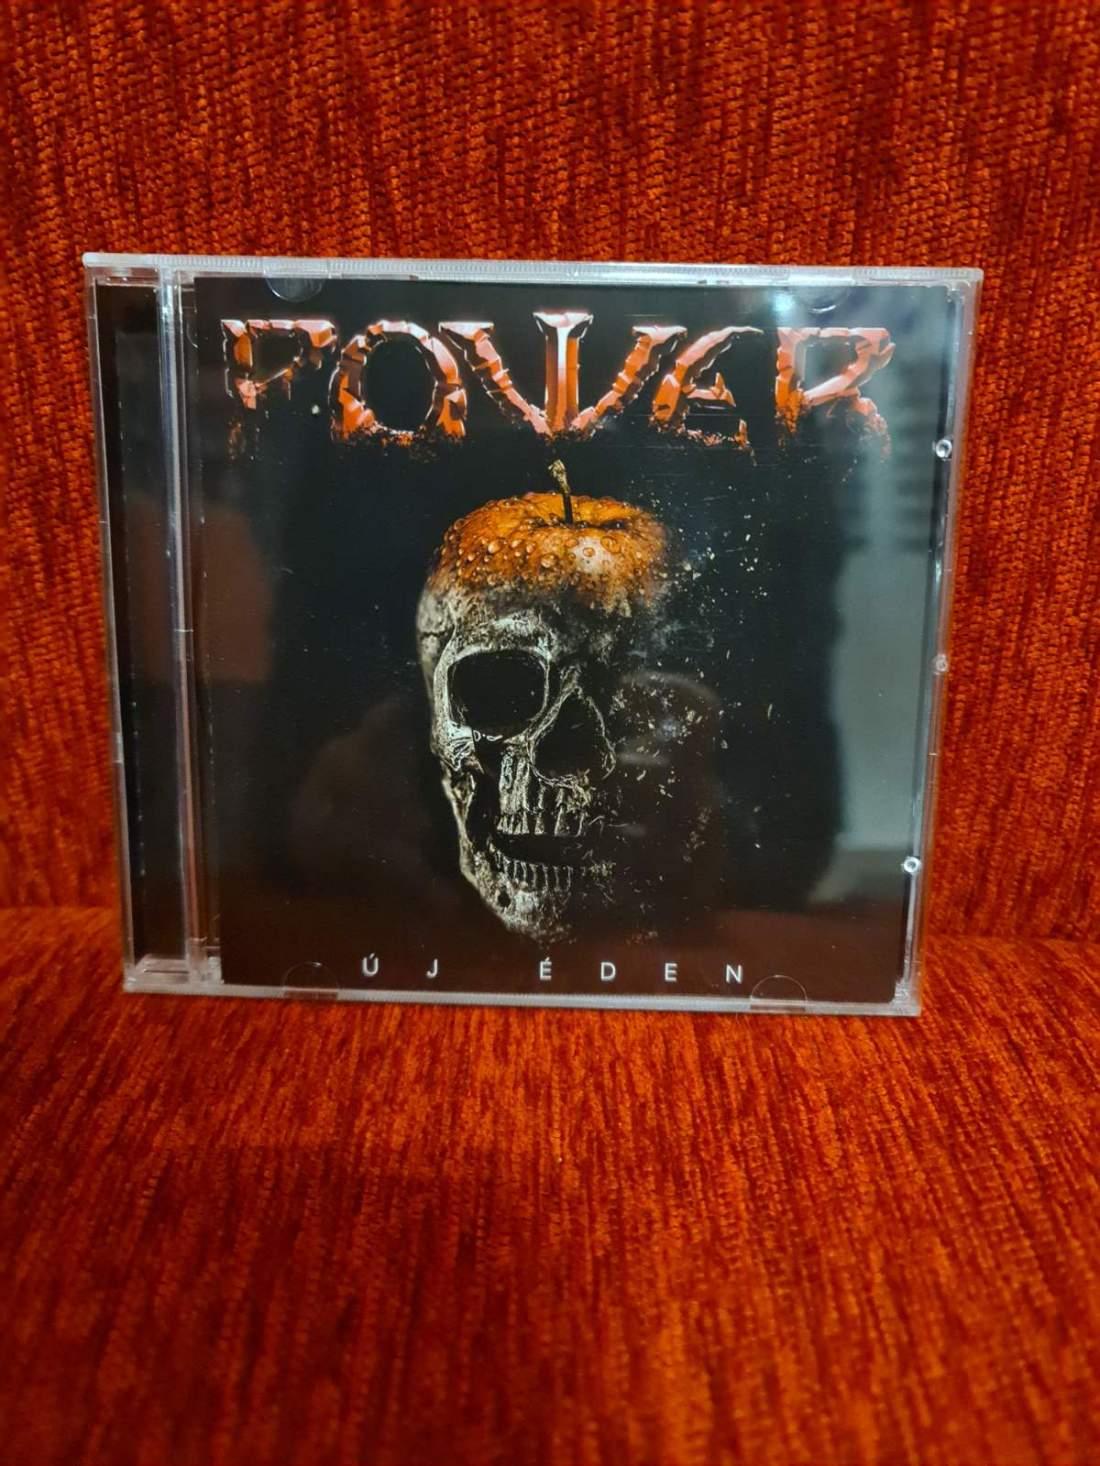 POWER - ÚJ ÉDEN CD